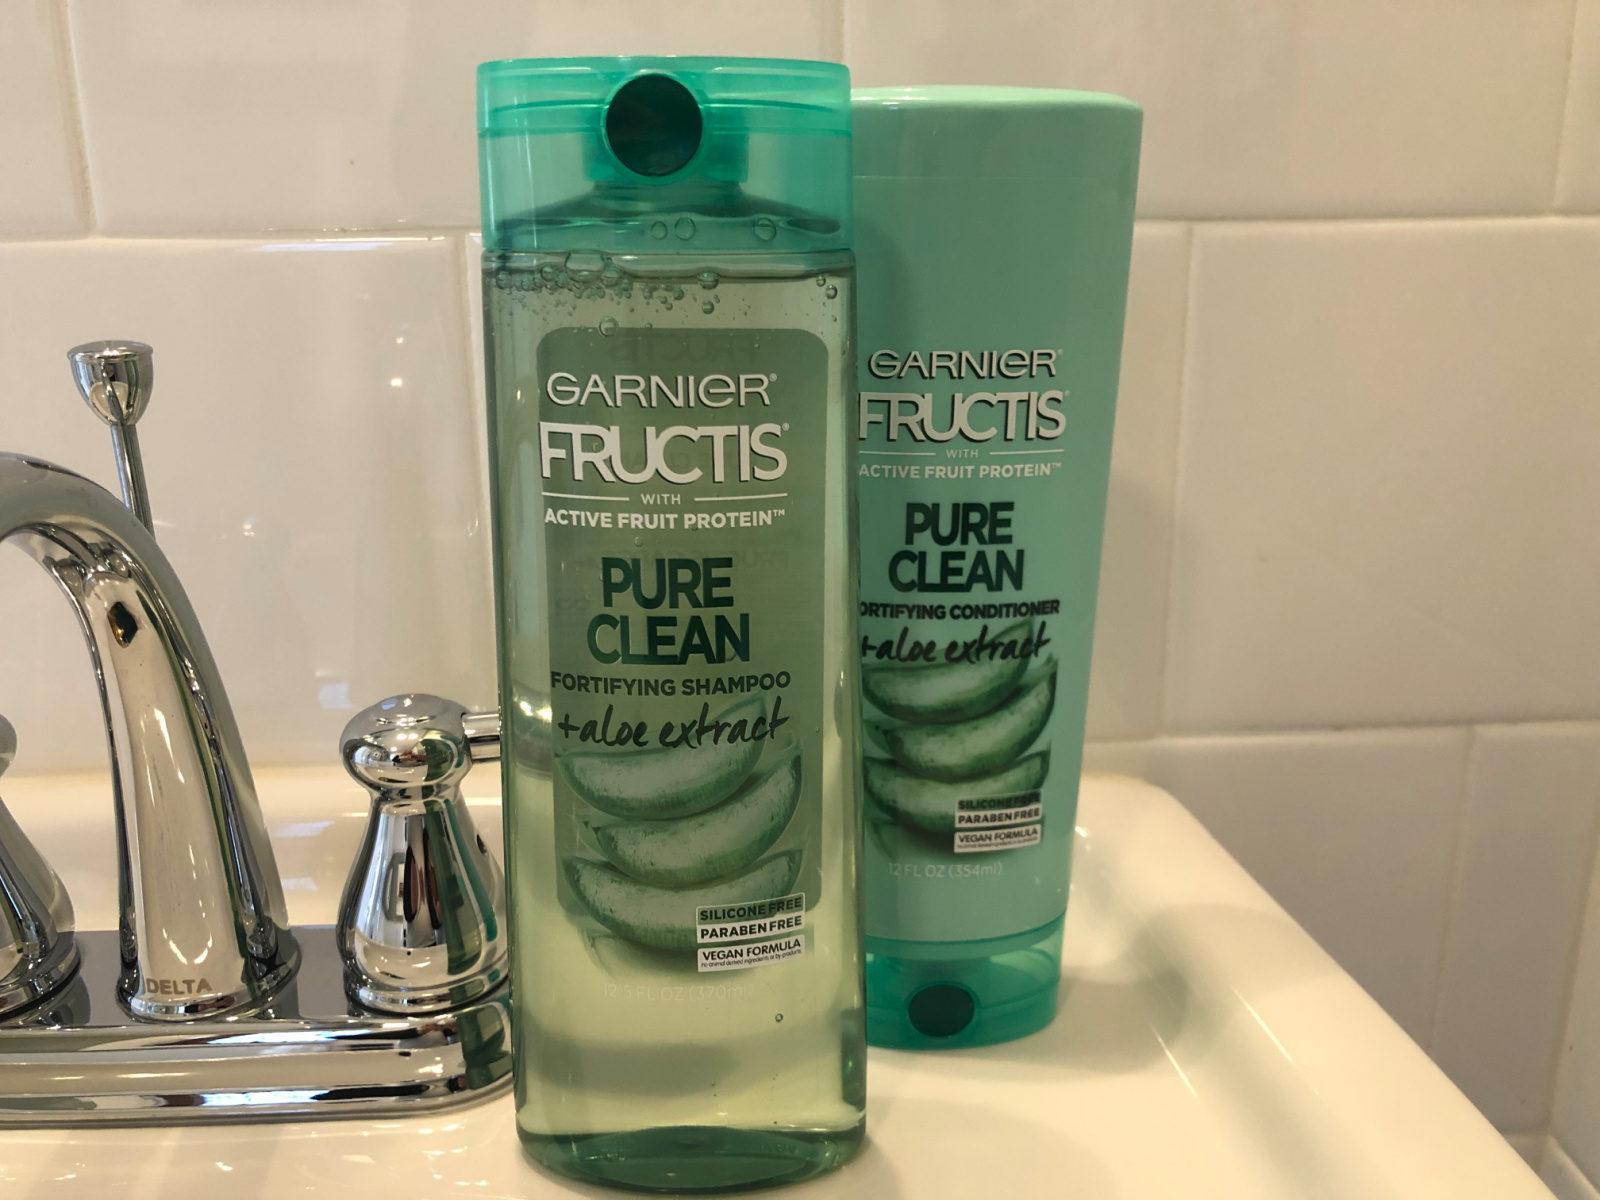 Garnier Fructis Hair Care Only $1.50 Per Bottle At Publix on I Heart Publix 4